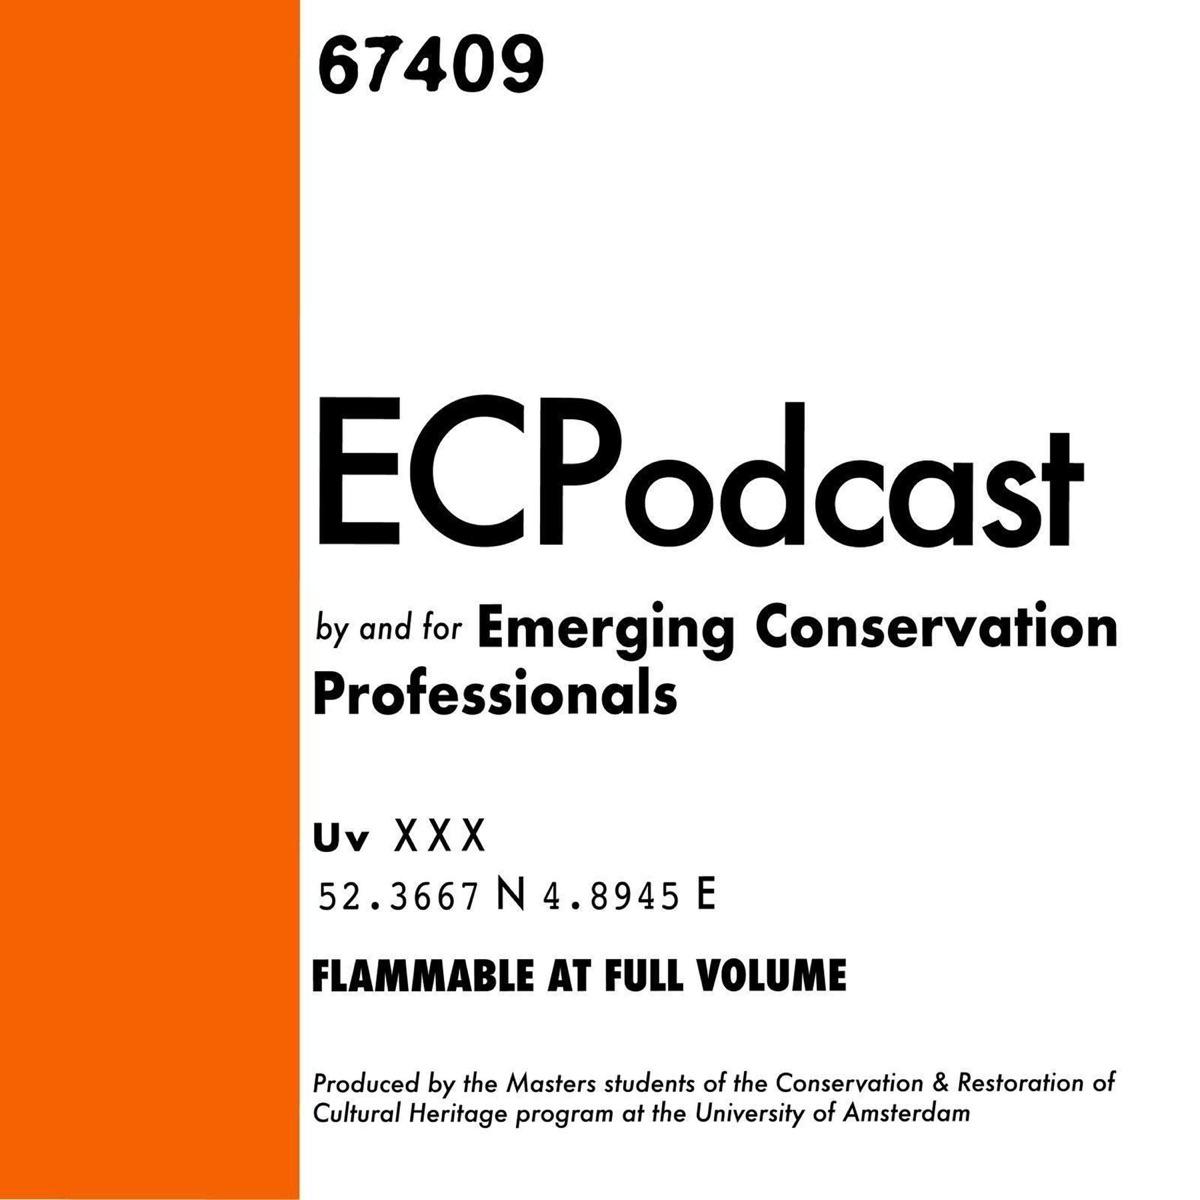 ECPodcast